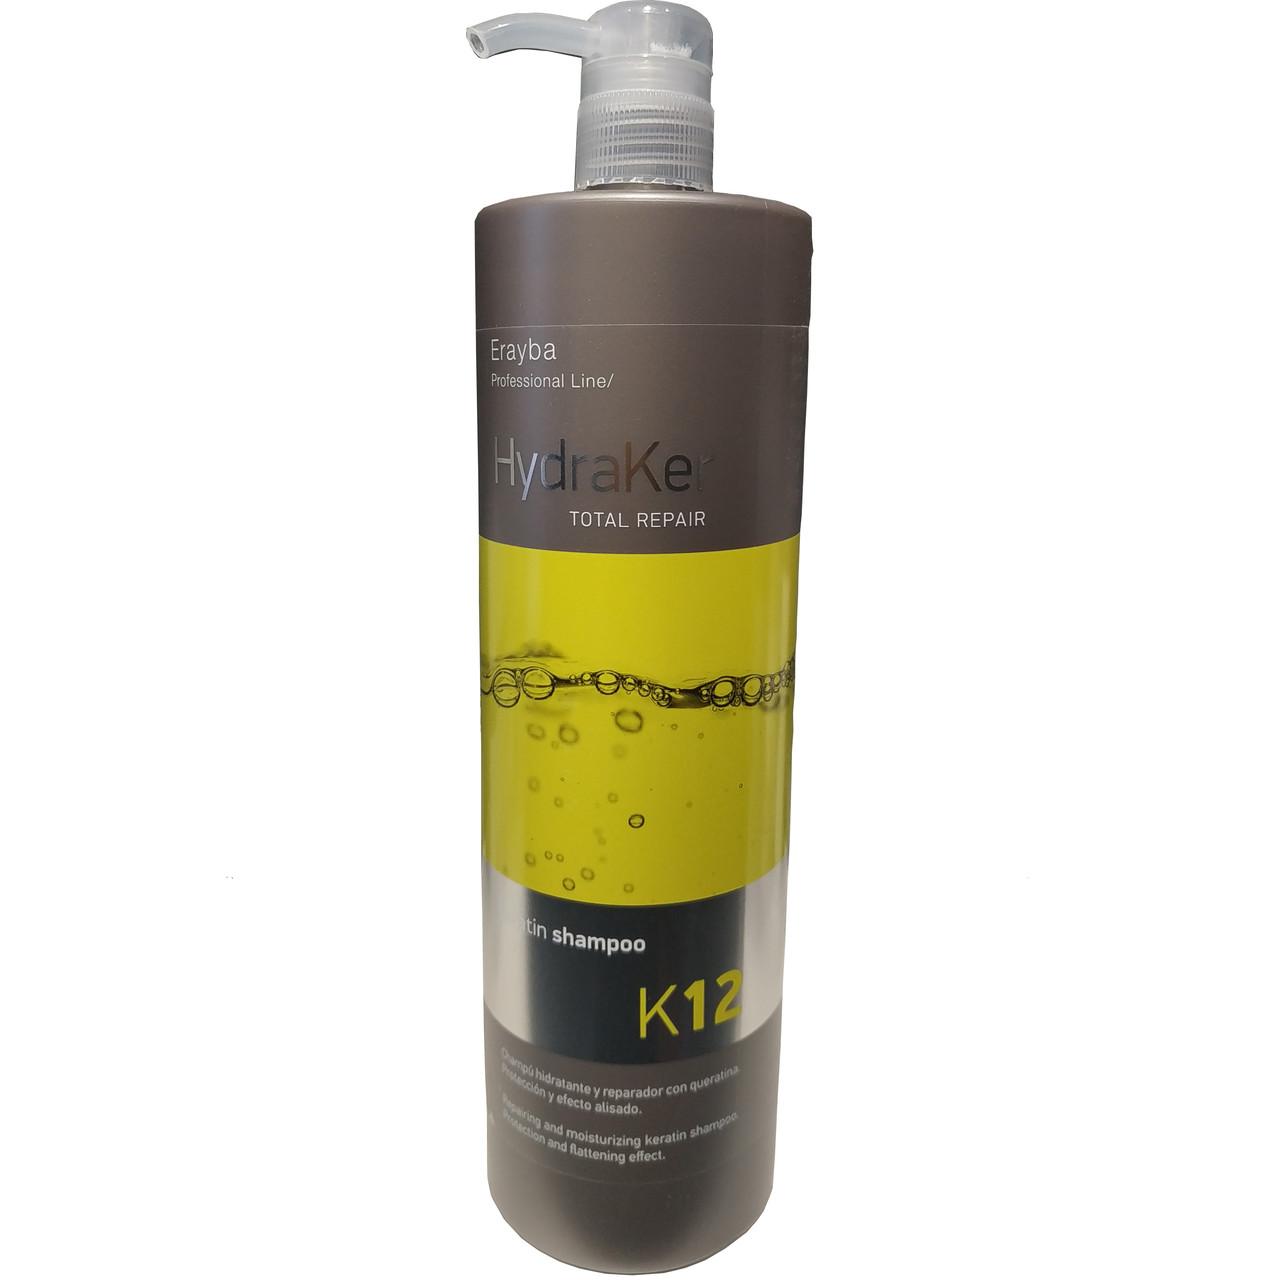 Шампунь для волос Erayba HydraKer Keratin Shampoo К12 1000 мл